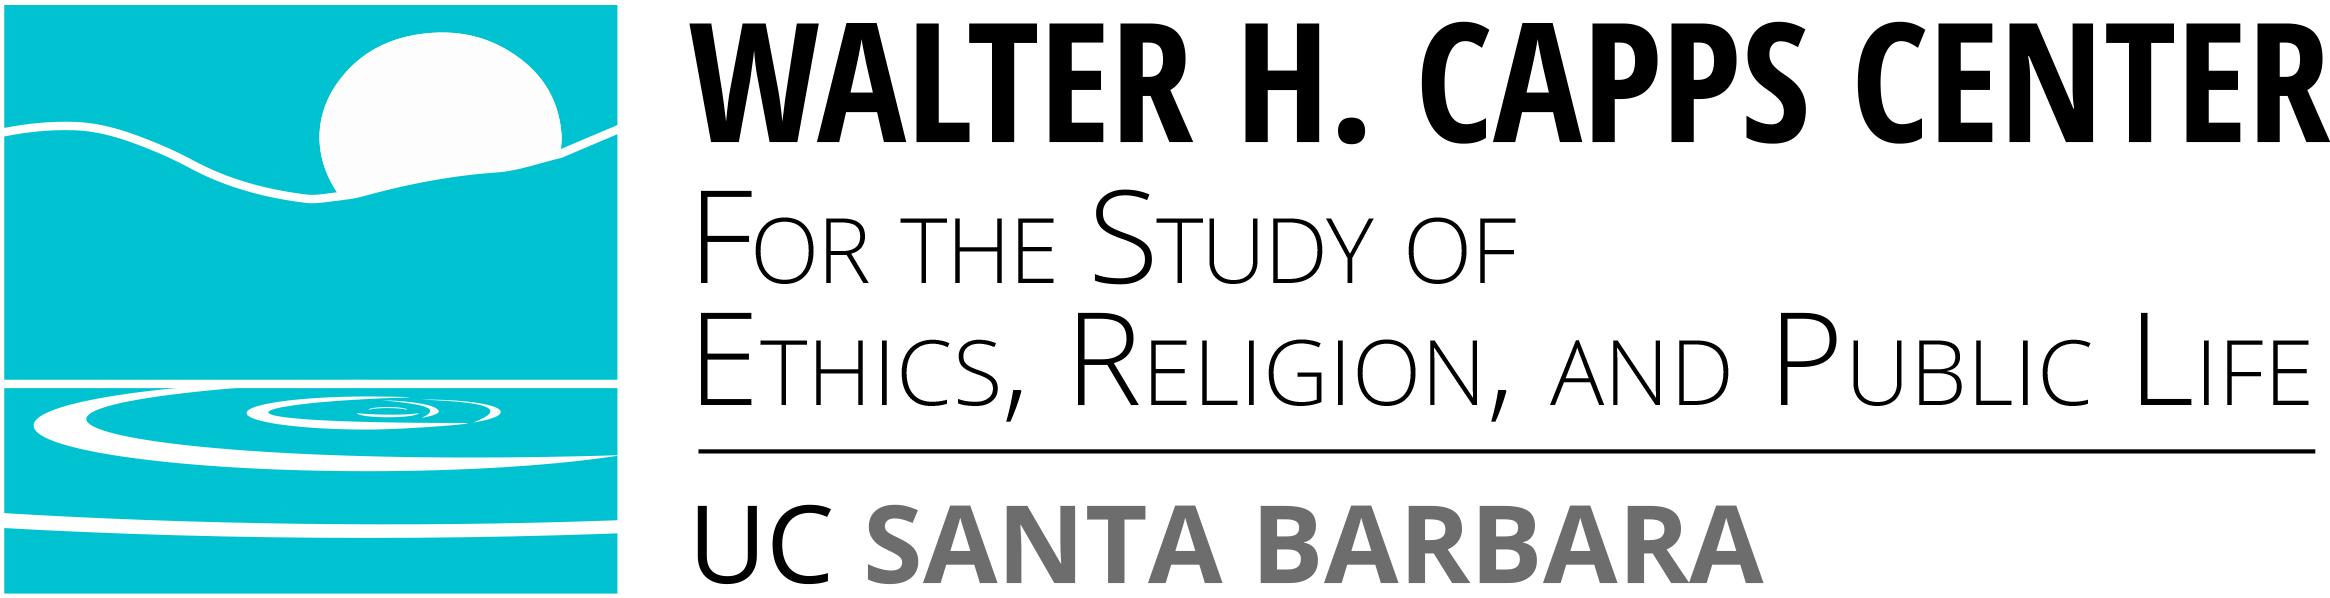 Walter H. Capps Center - UC Santa Barbara